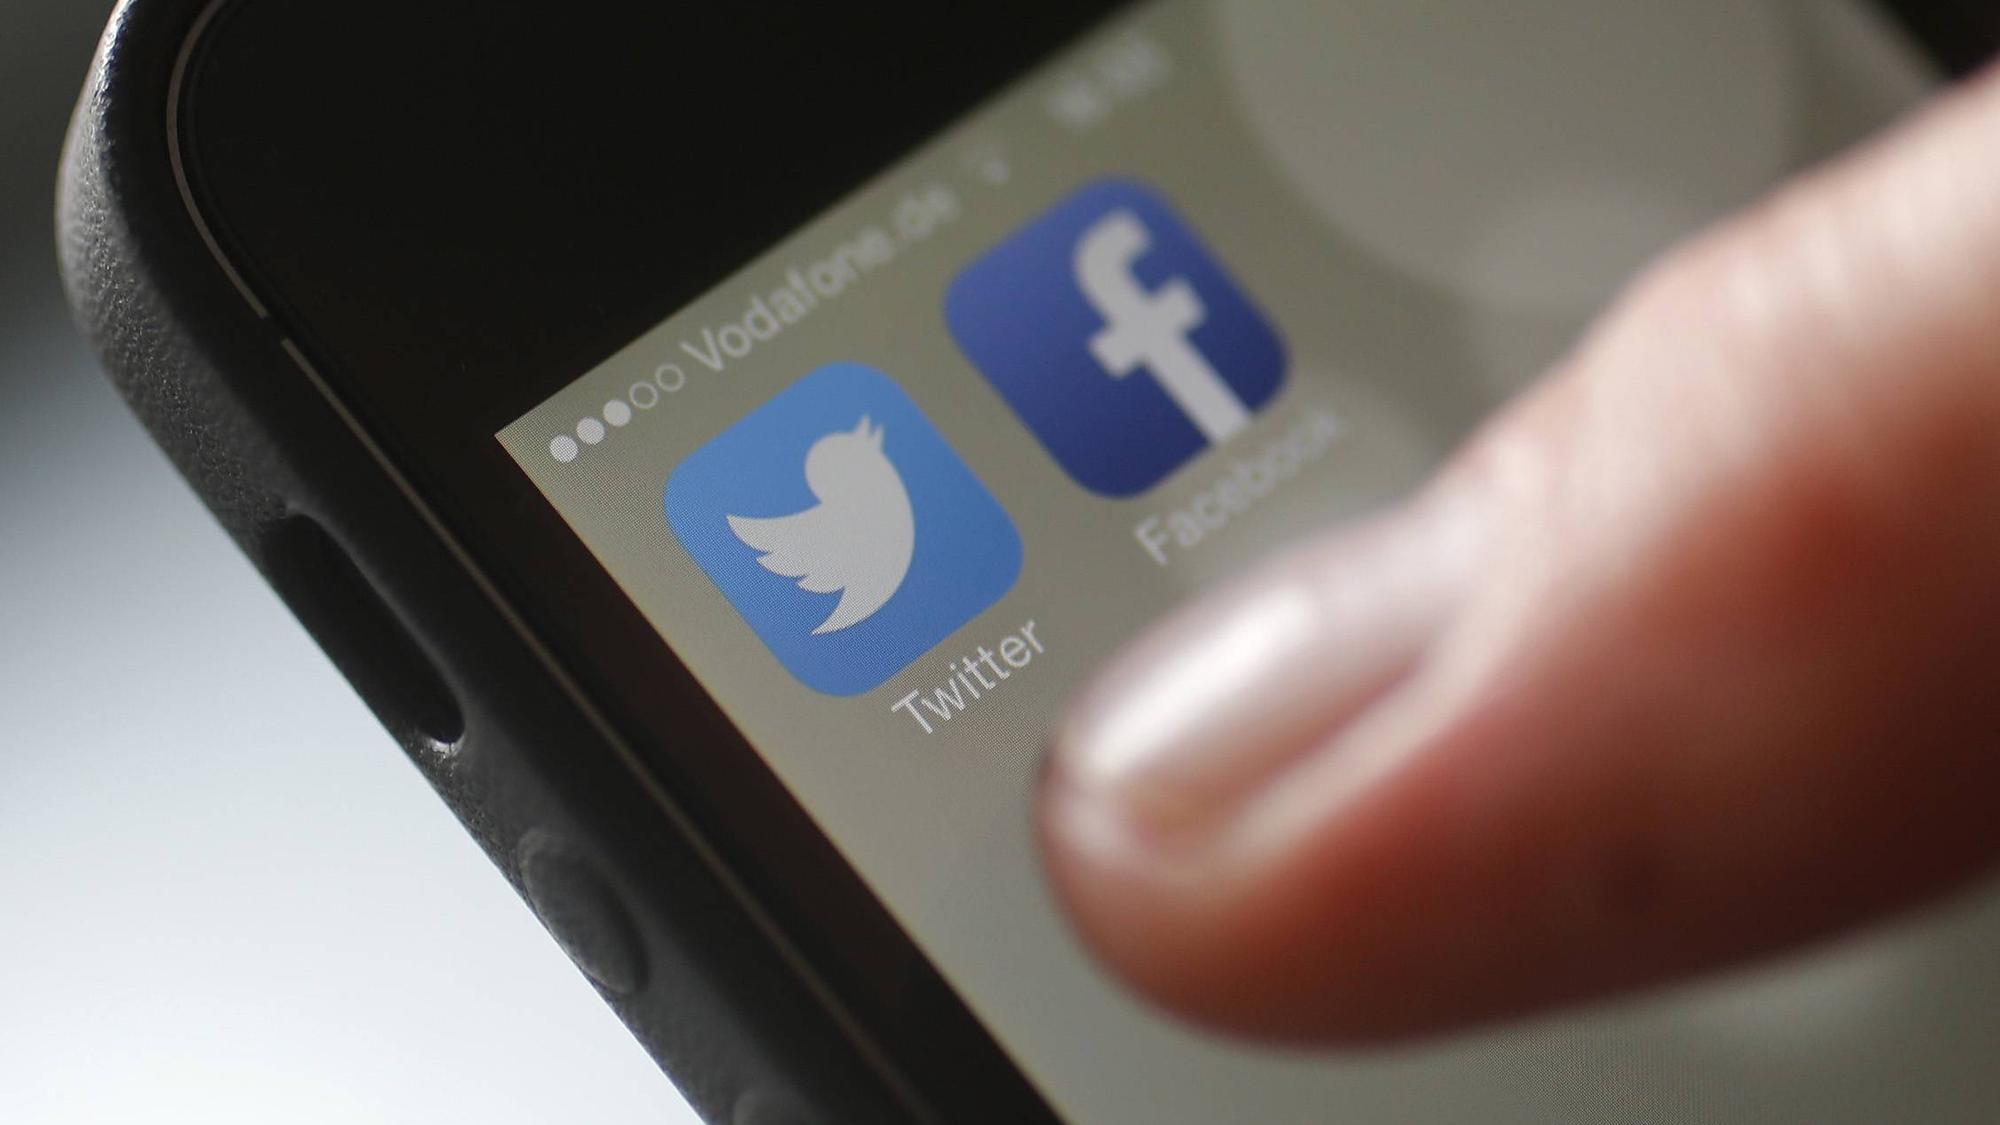 Servicio de Twitter se restablece parcialmente luego de caída global